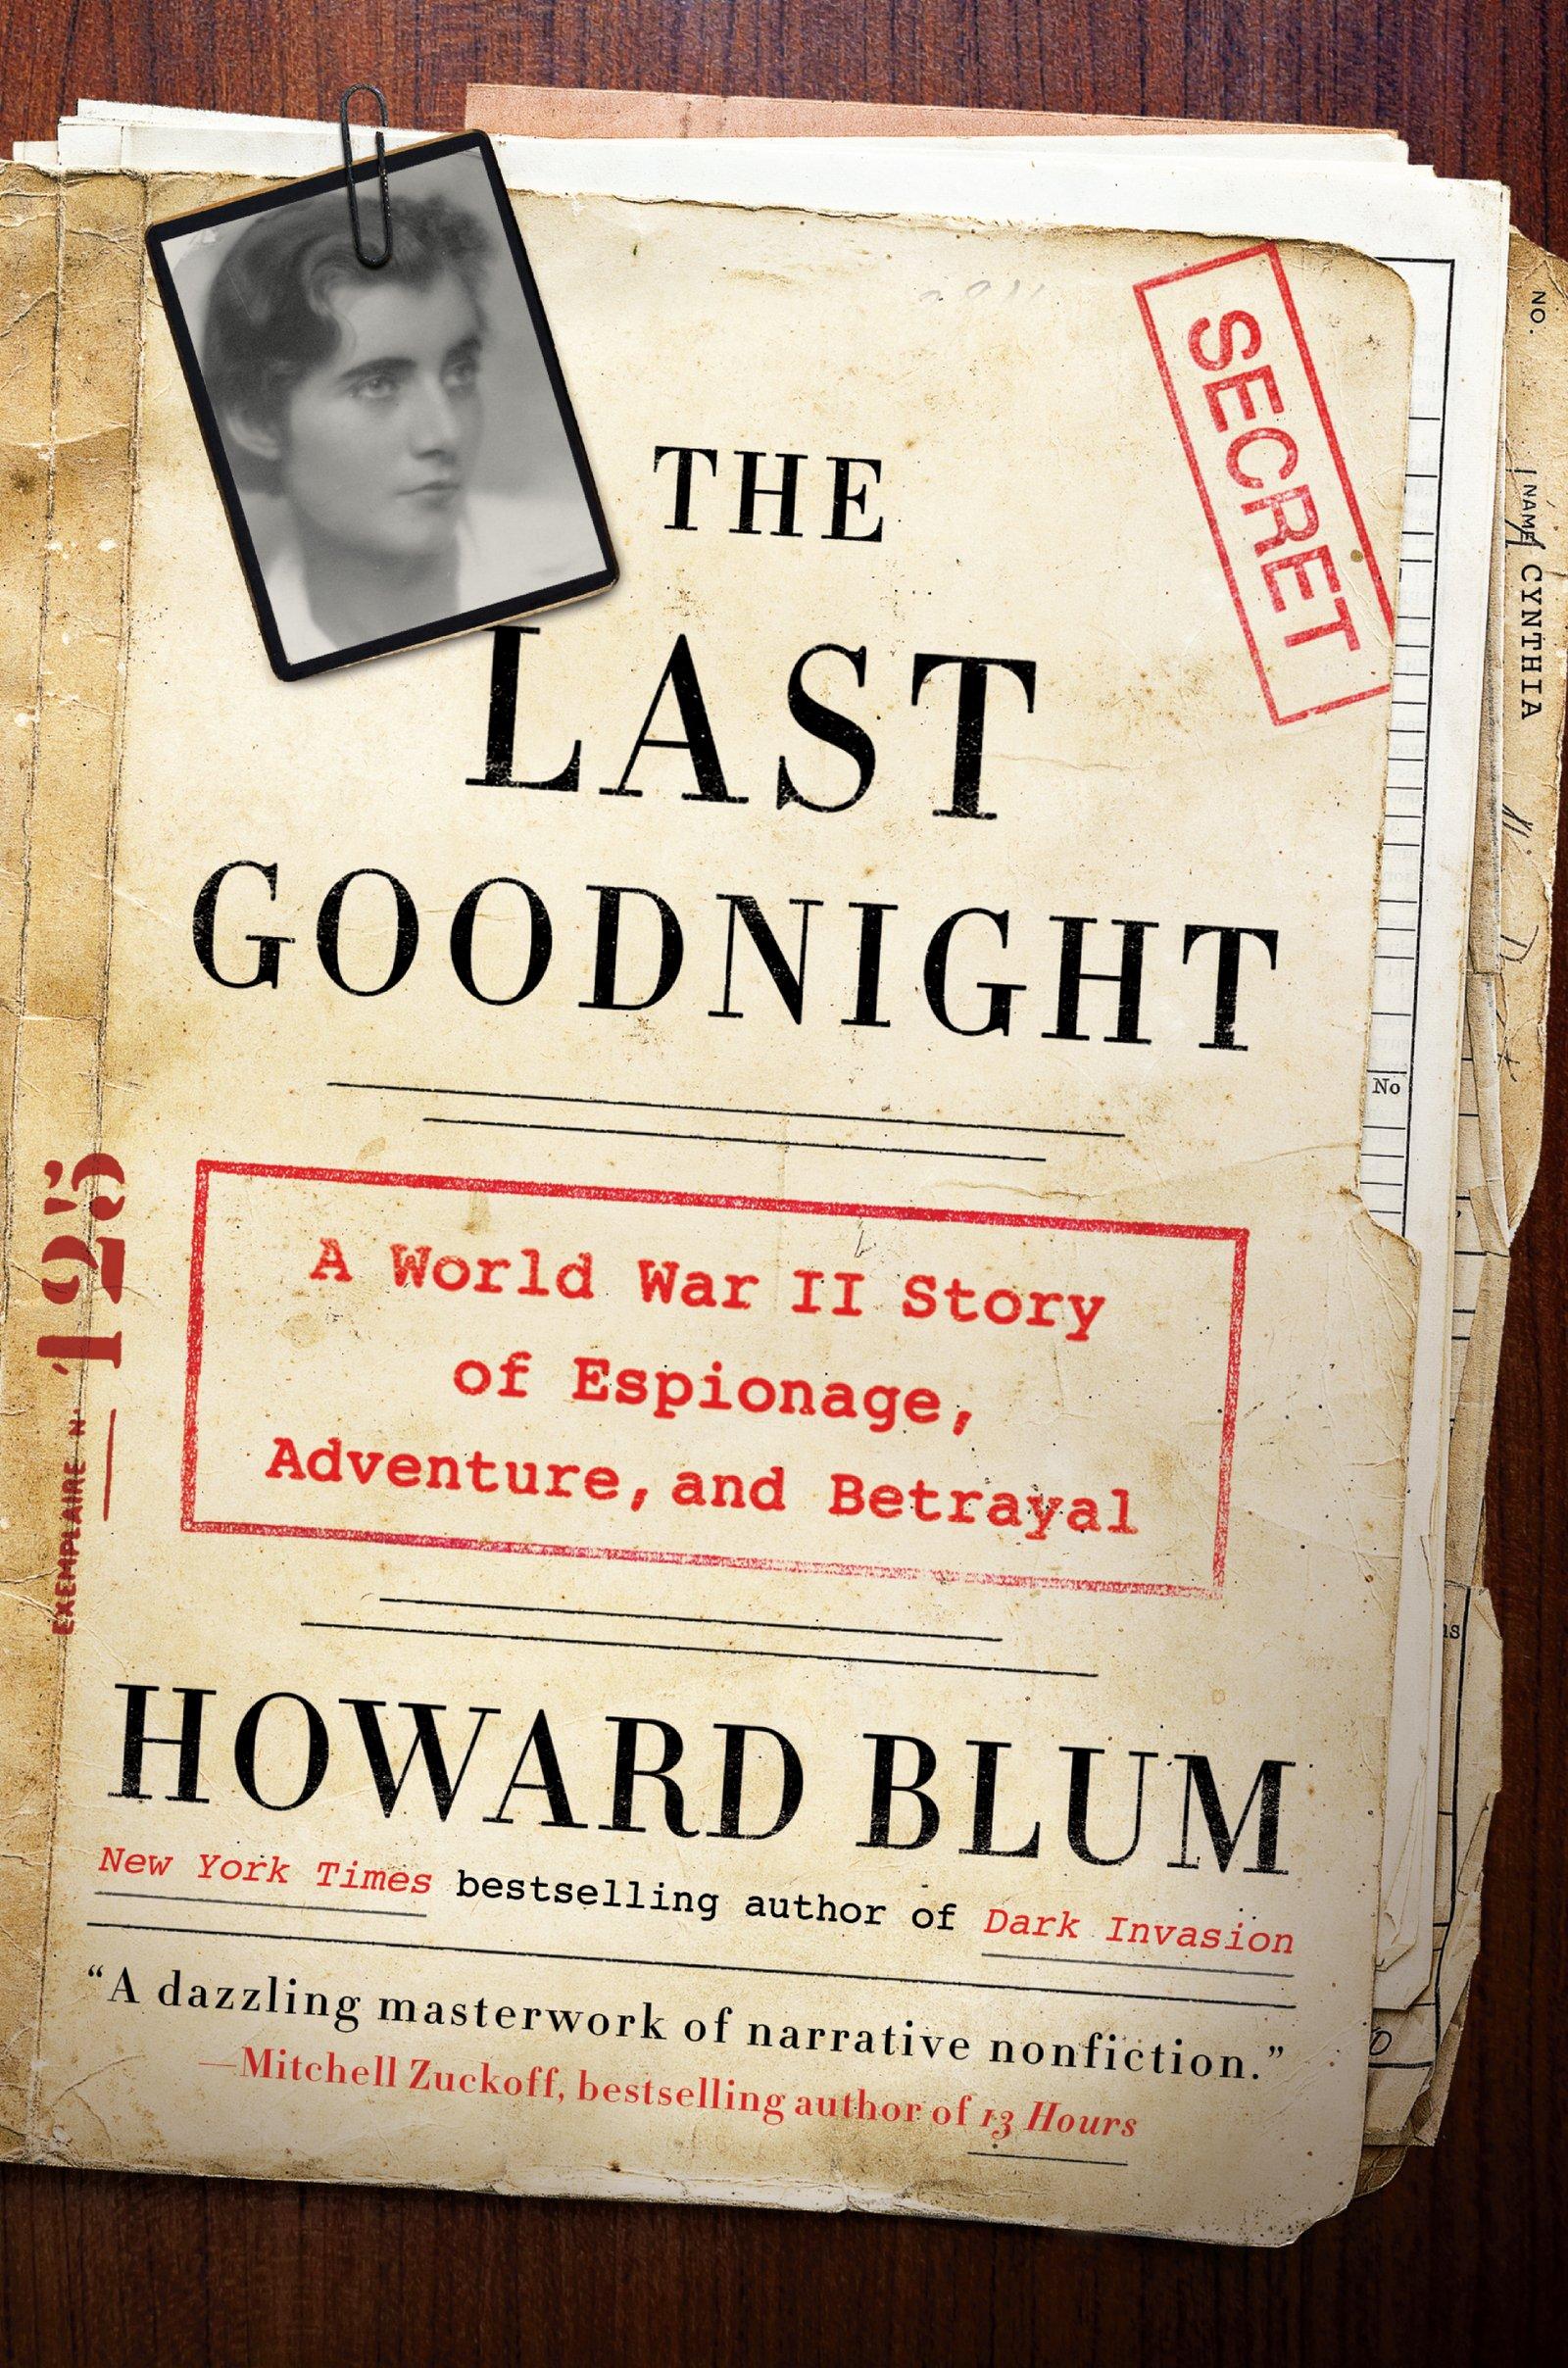 A World War II Story of Espionage, Adventure, and Betrayal - Howard Blum